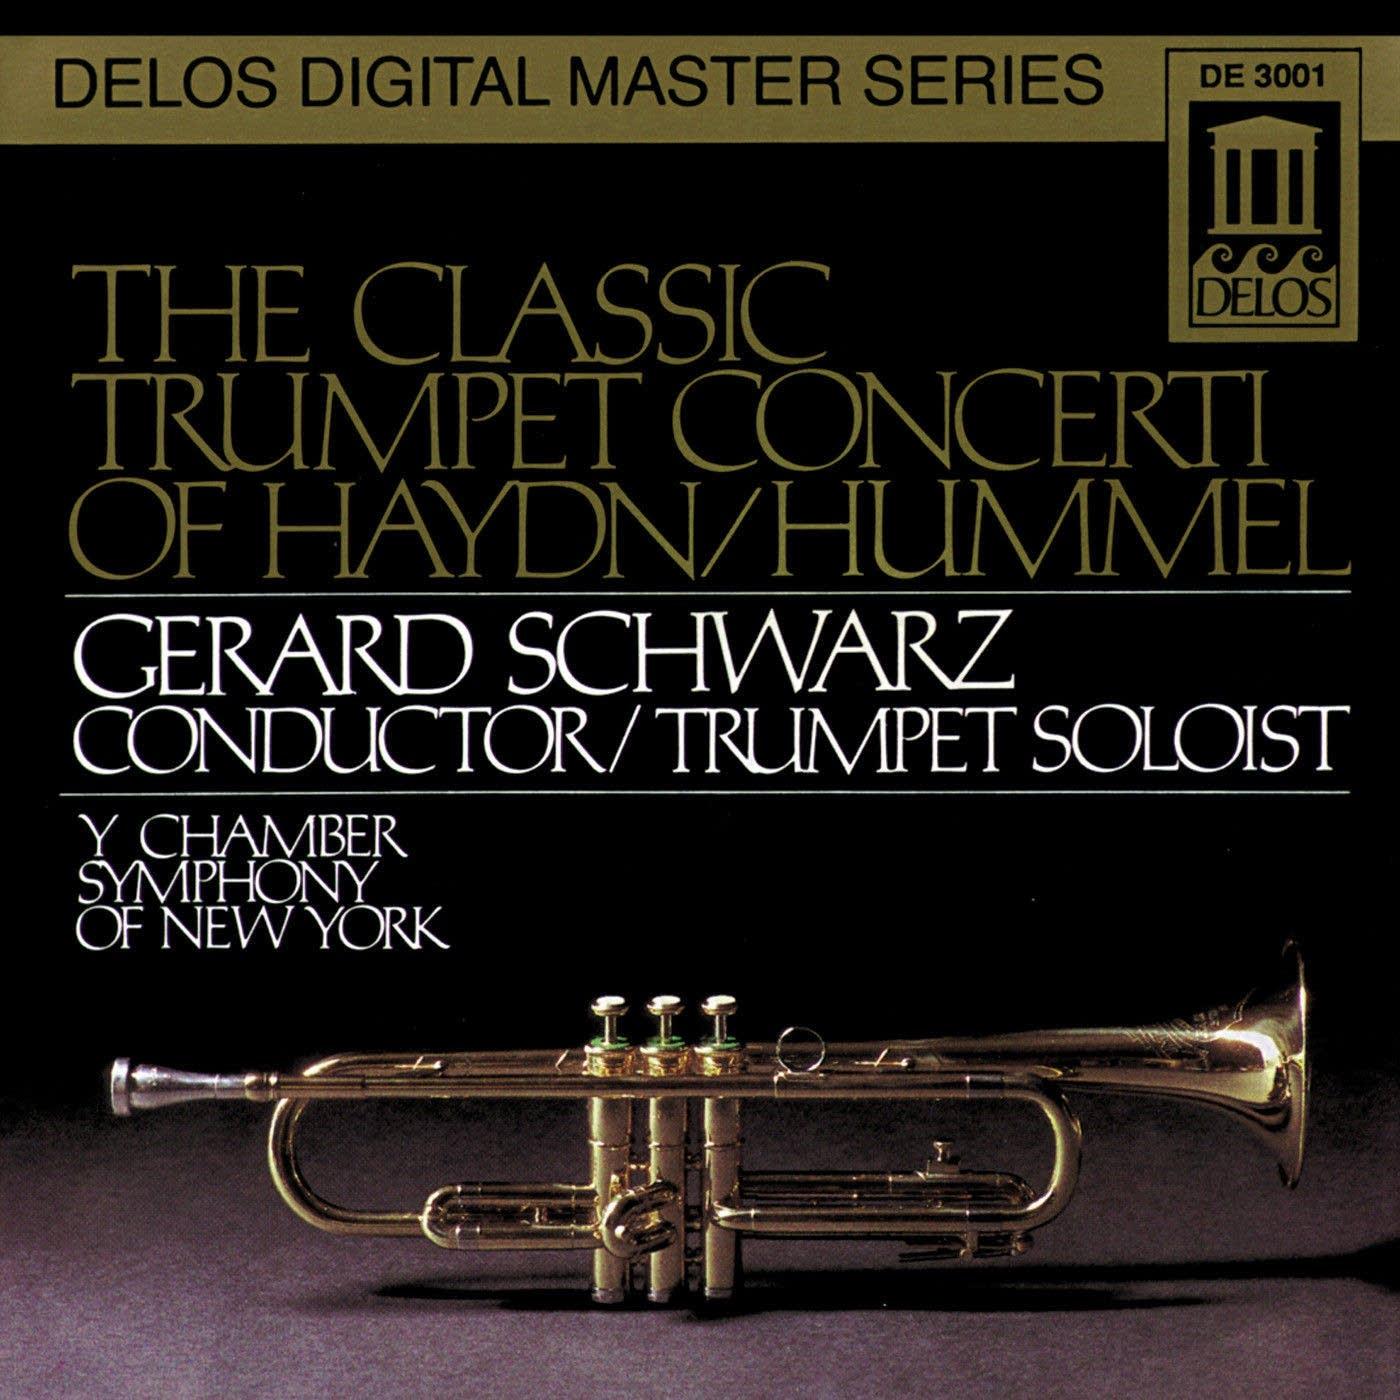 Johann Nepomuk Hummel - Trumpet Concerto: Allegro con spirito